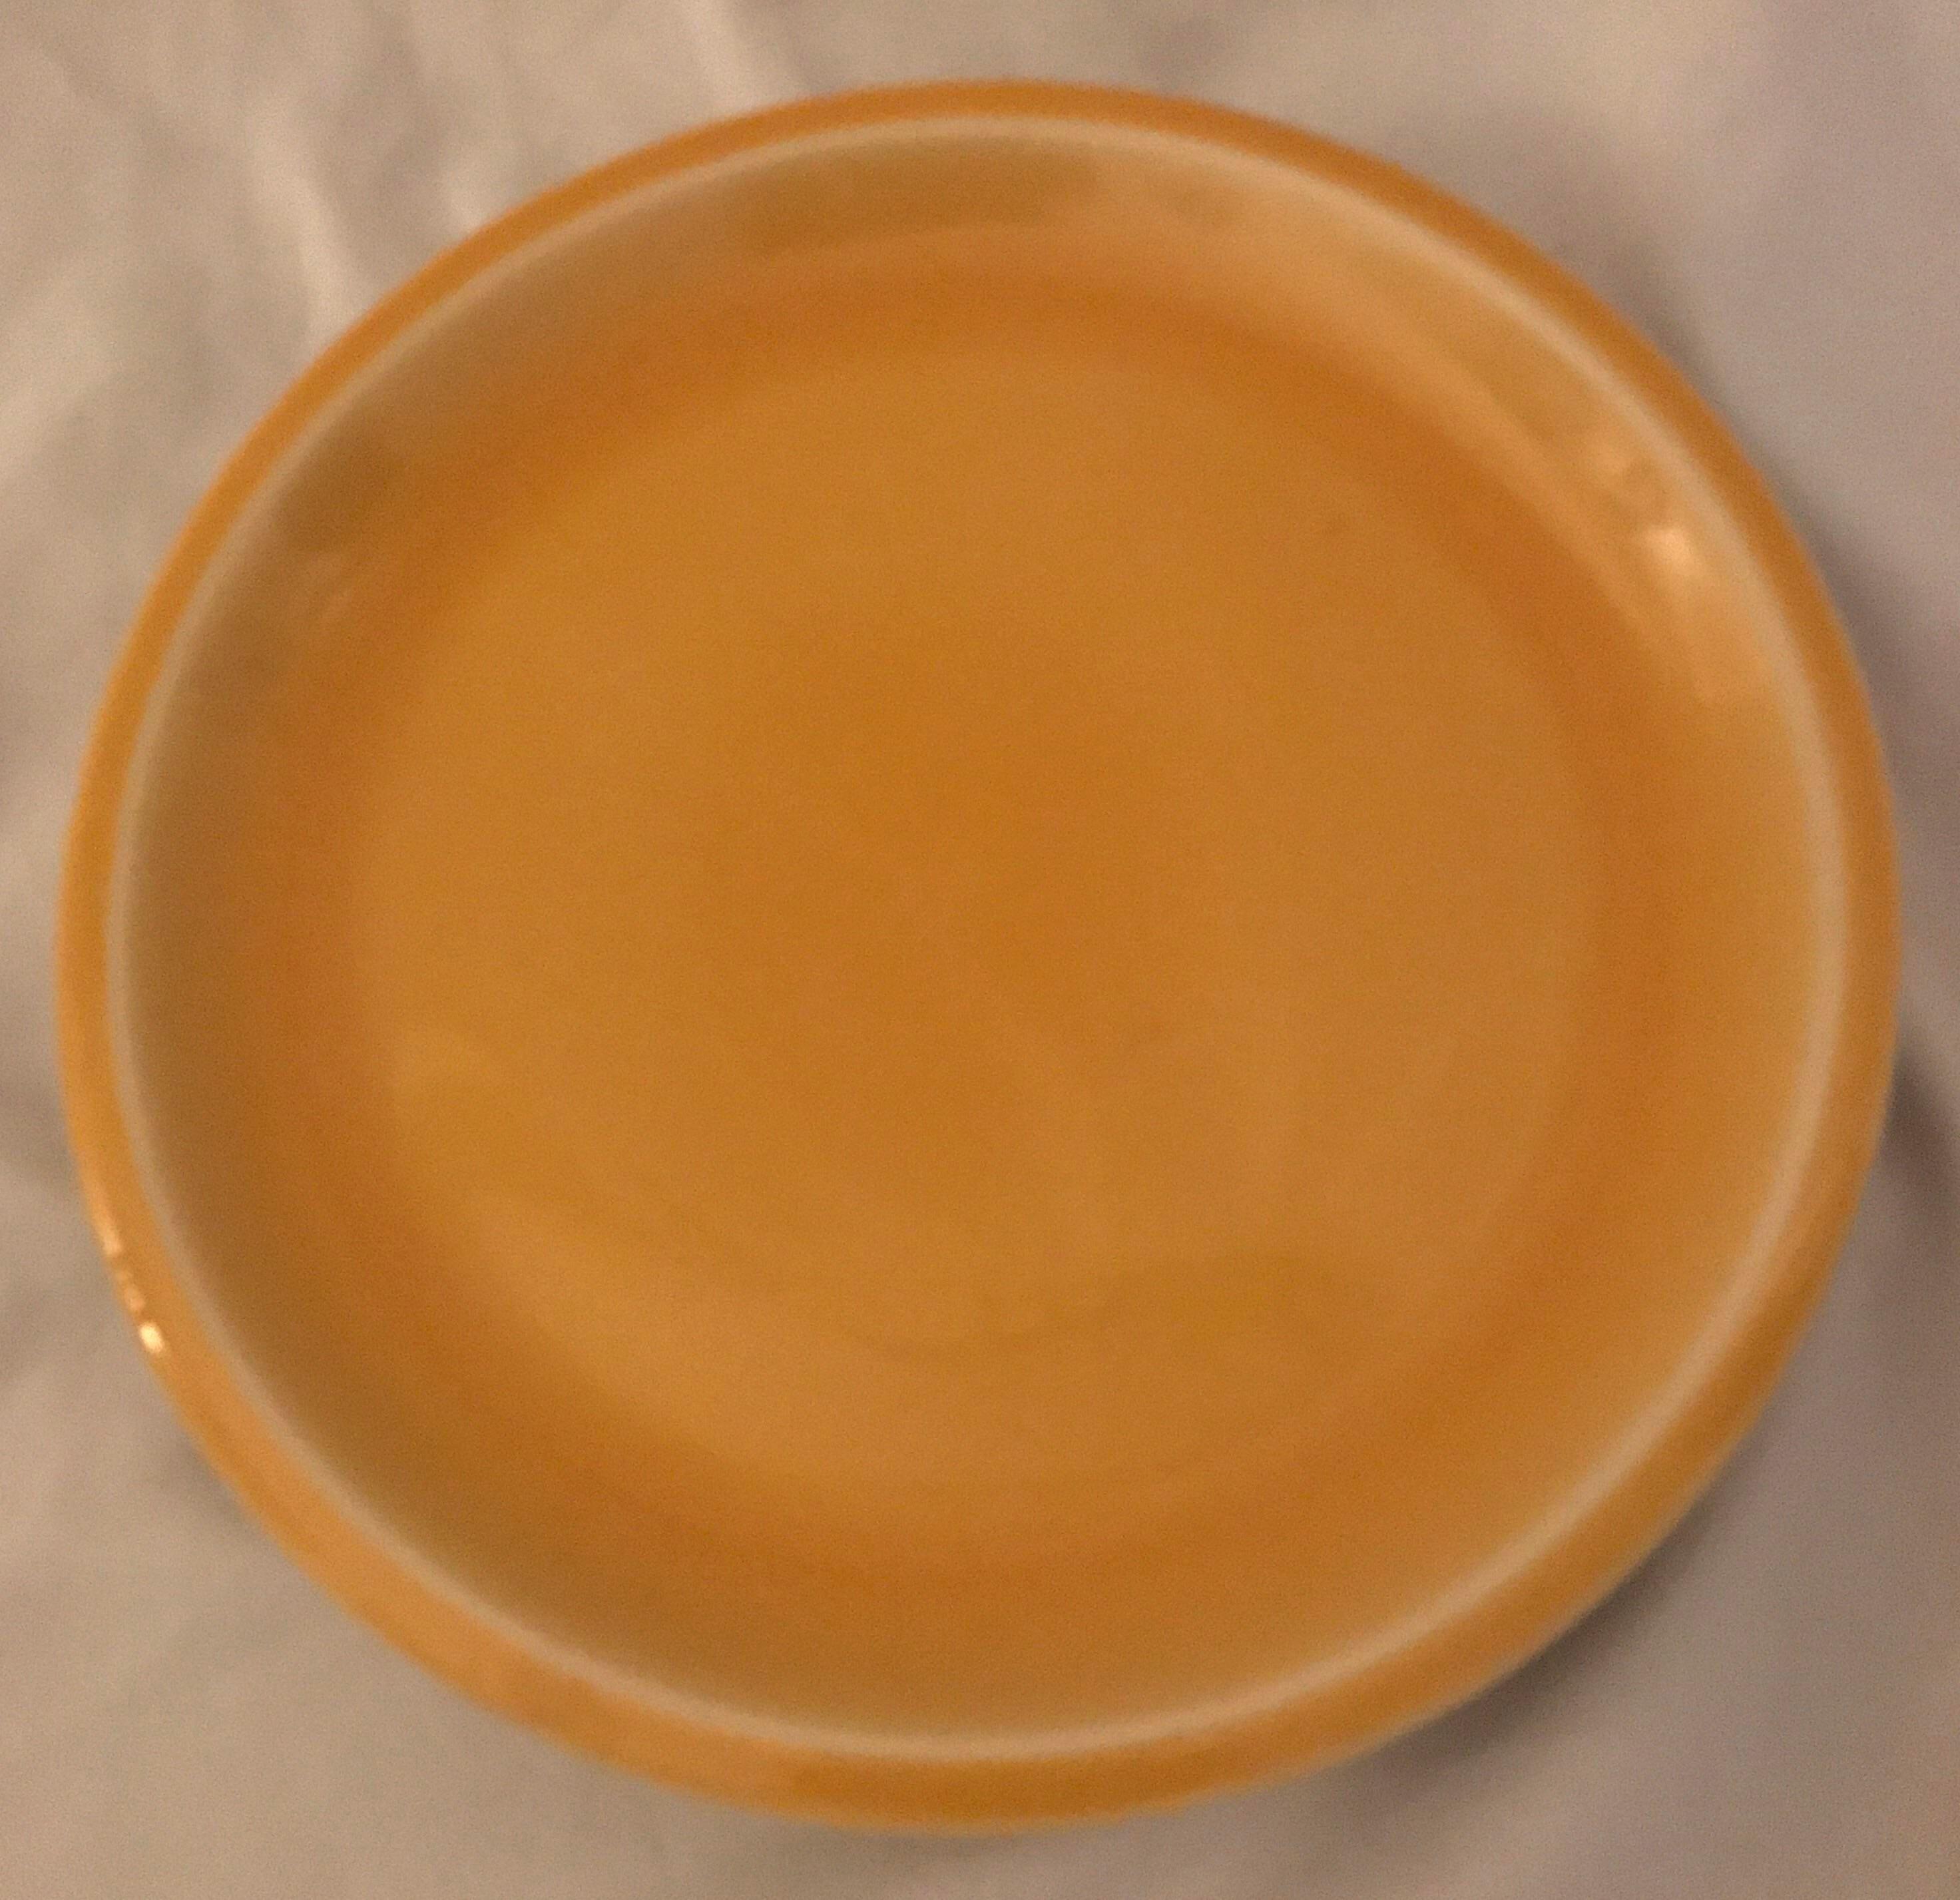 Jars of France Orange Dinner Plates u0026 Yellow Salad Plates - 8 Pieces - Image 6  sc 1 st  Chairish & Jars of France Orange Dinner Plates u0026 Yellow Salad Plates - 8 Pieces ...